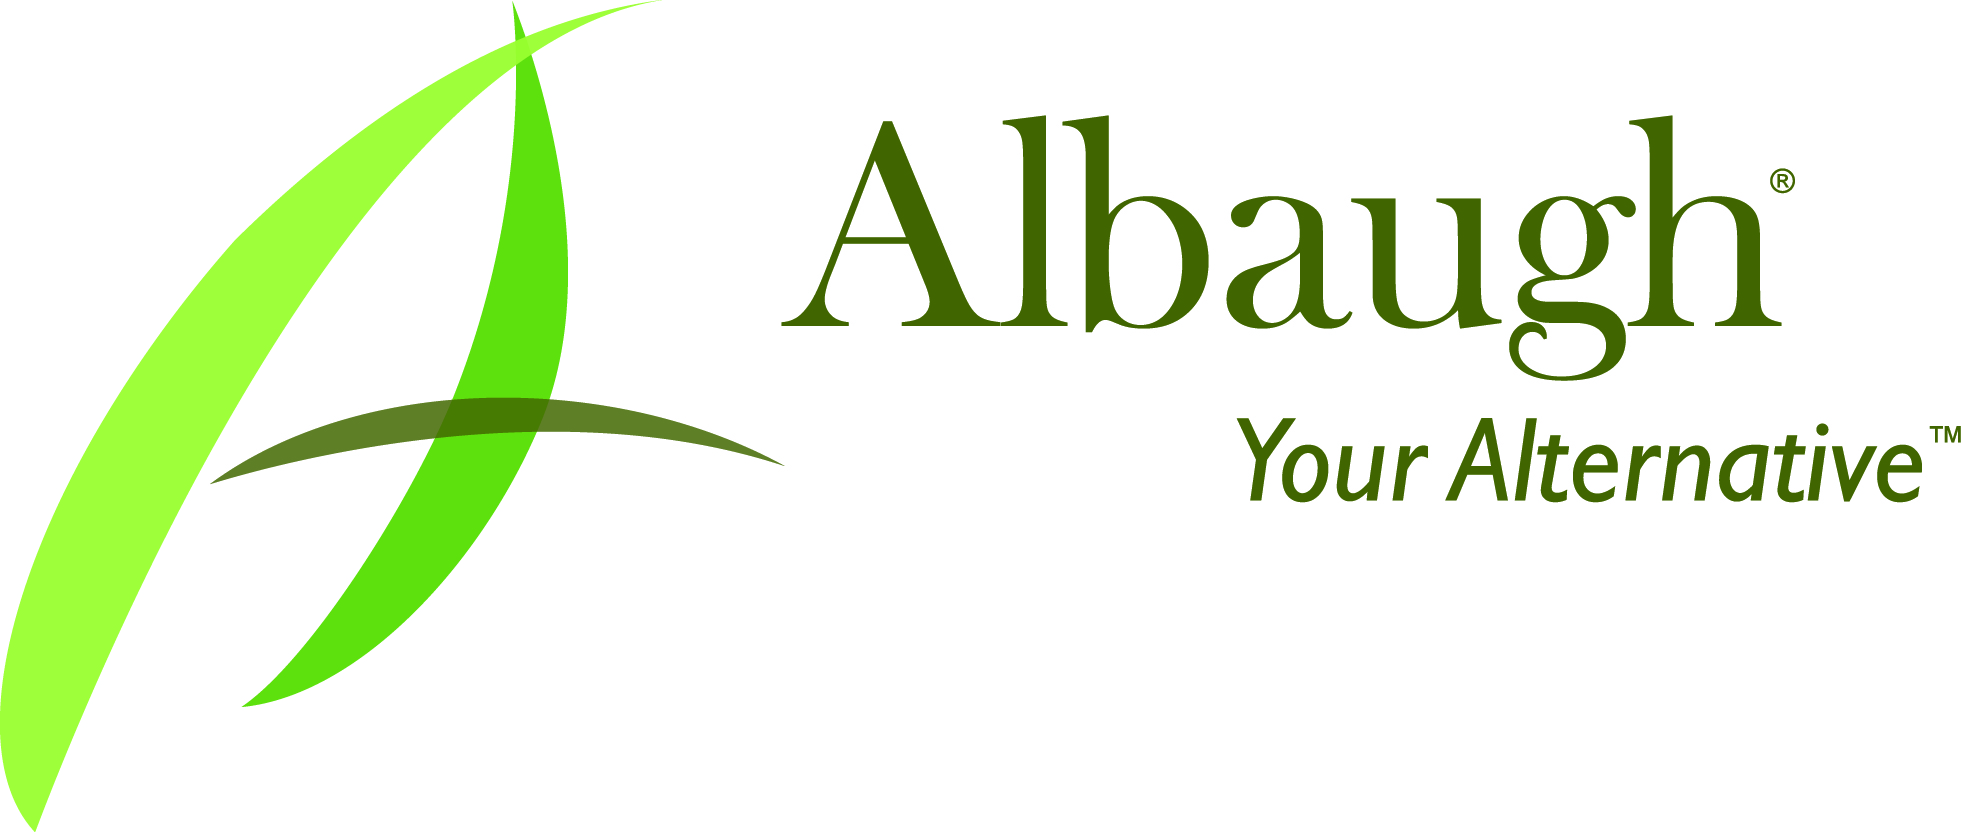 Albaugh - Your Alternative